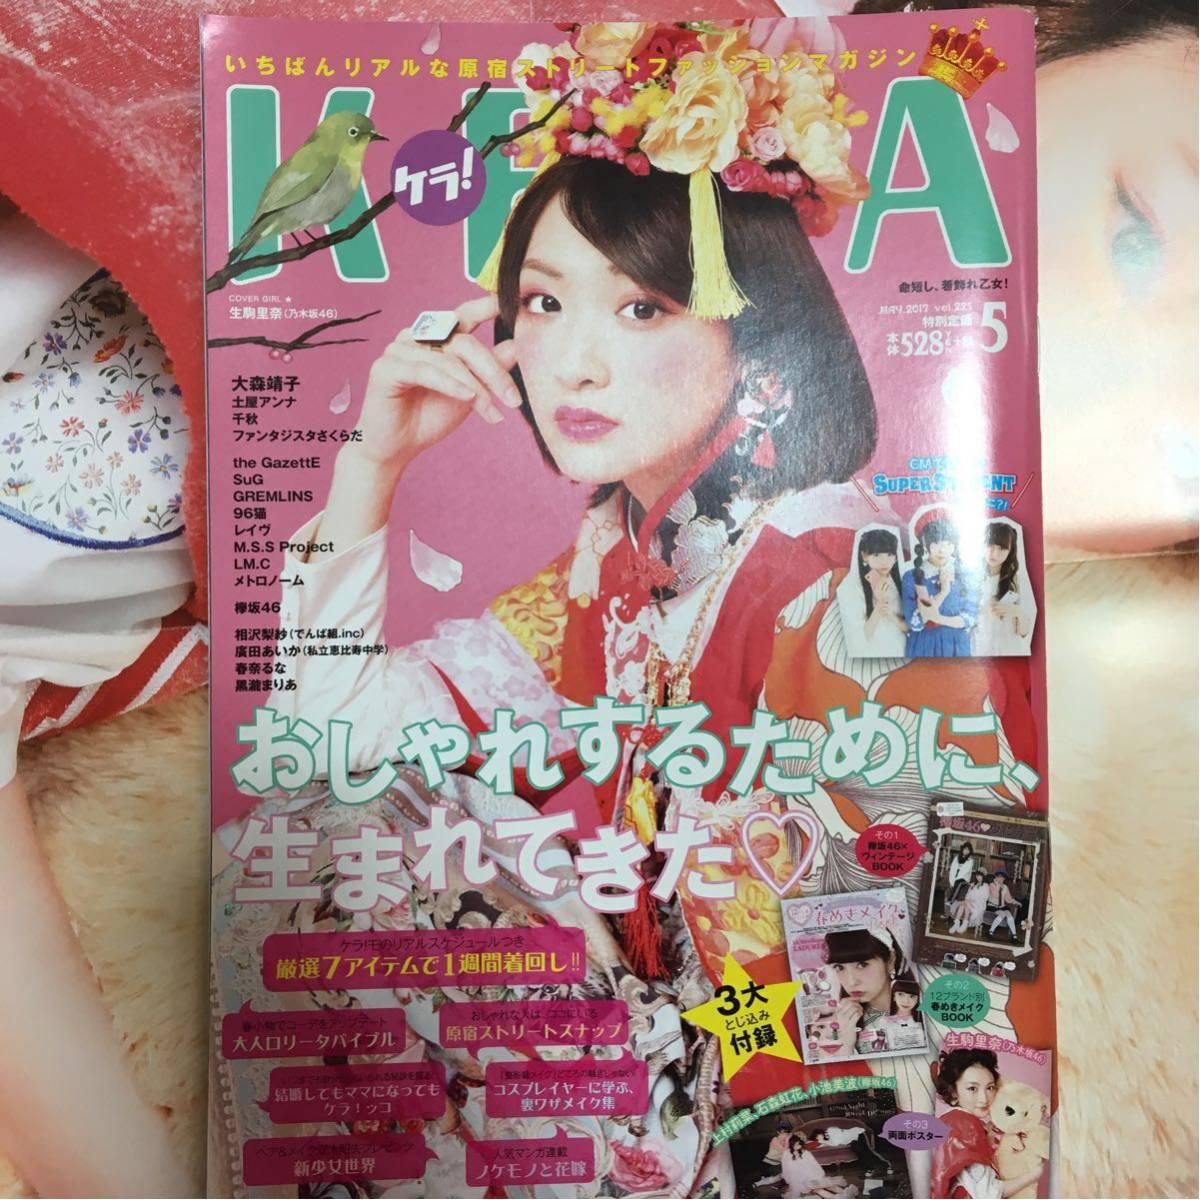 KERA 2017年5月号 生駒里奈掲載 ポスター付き